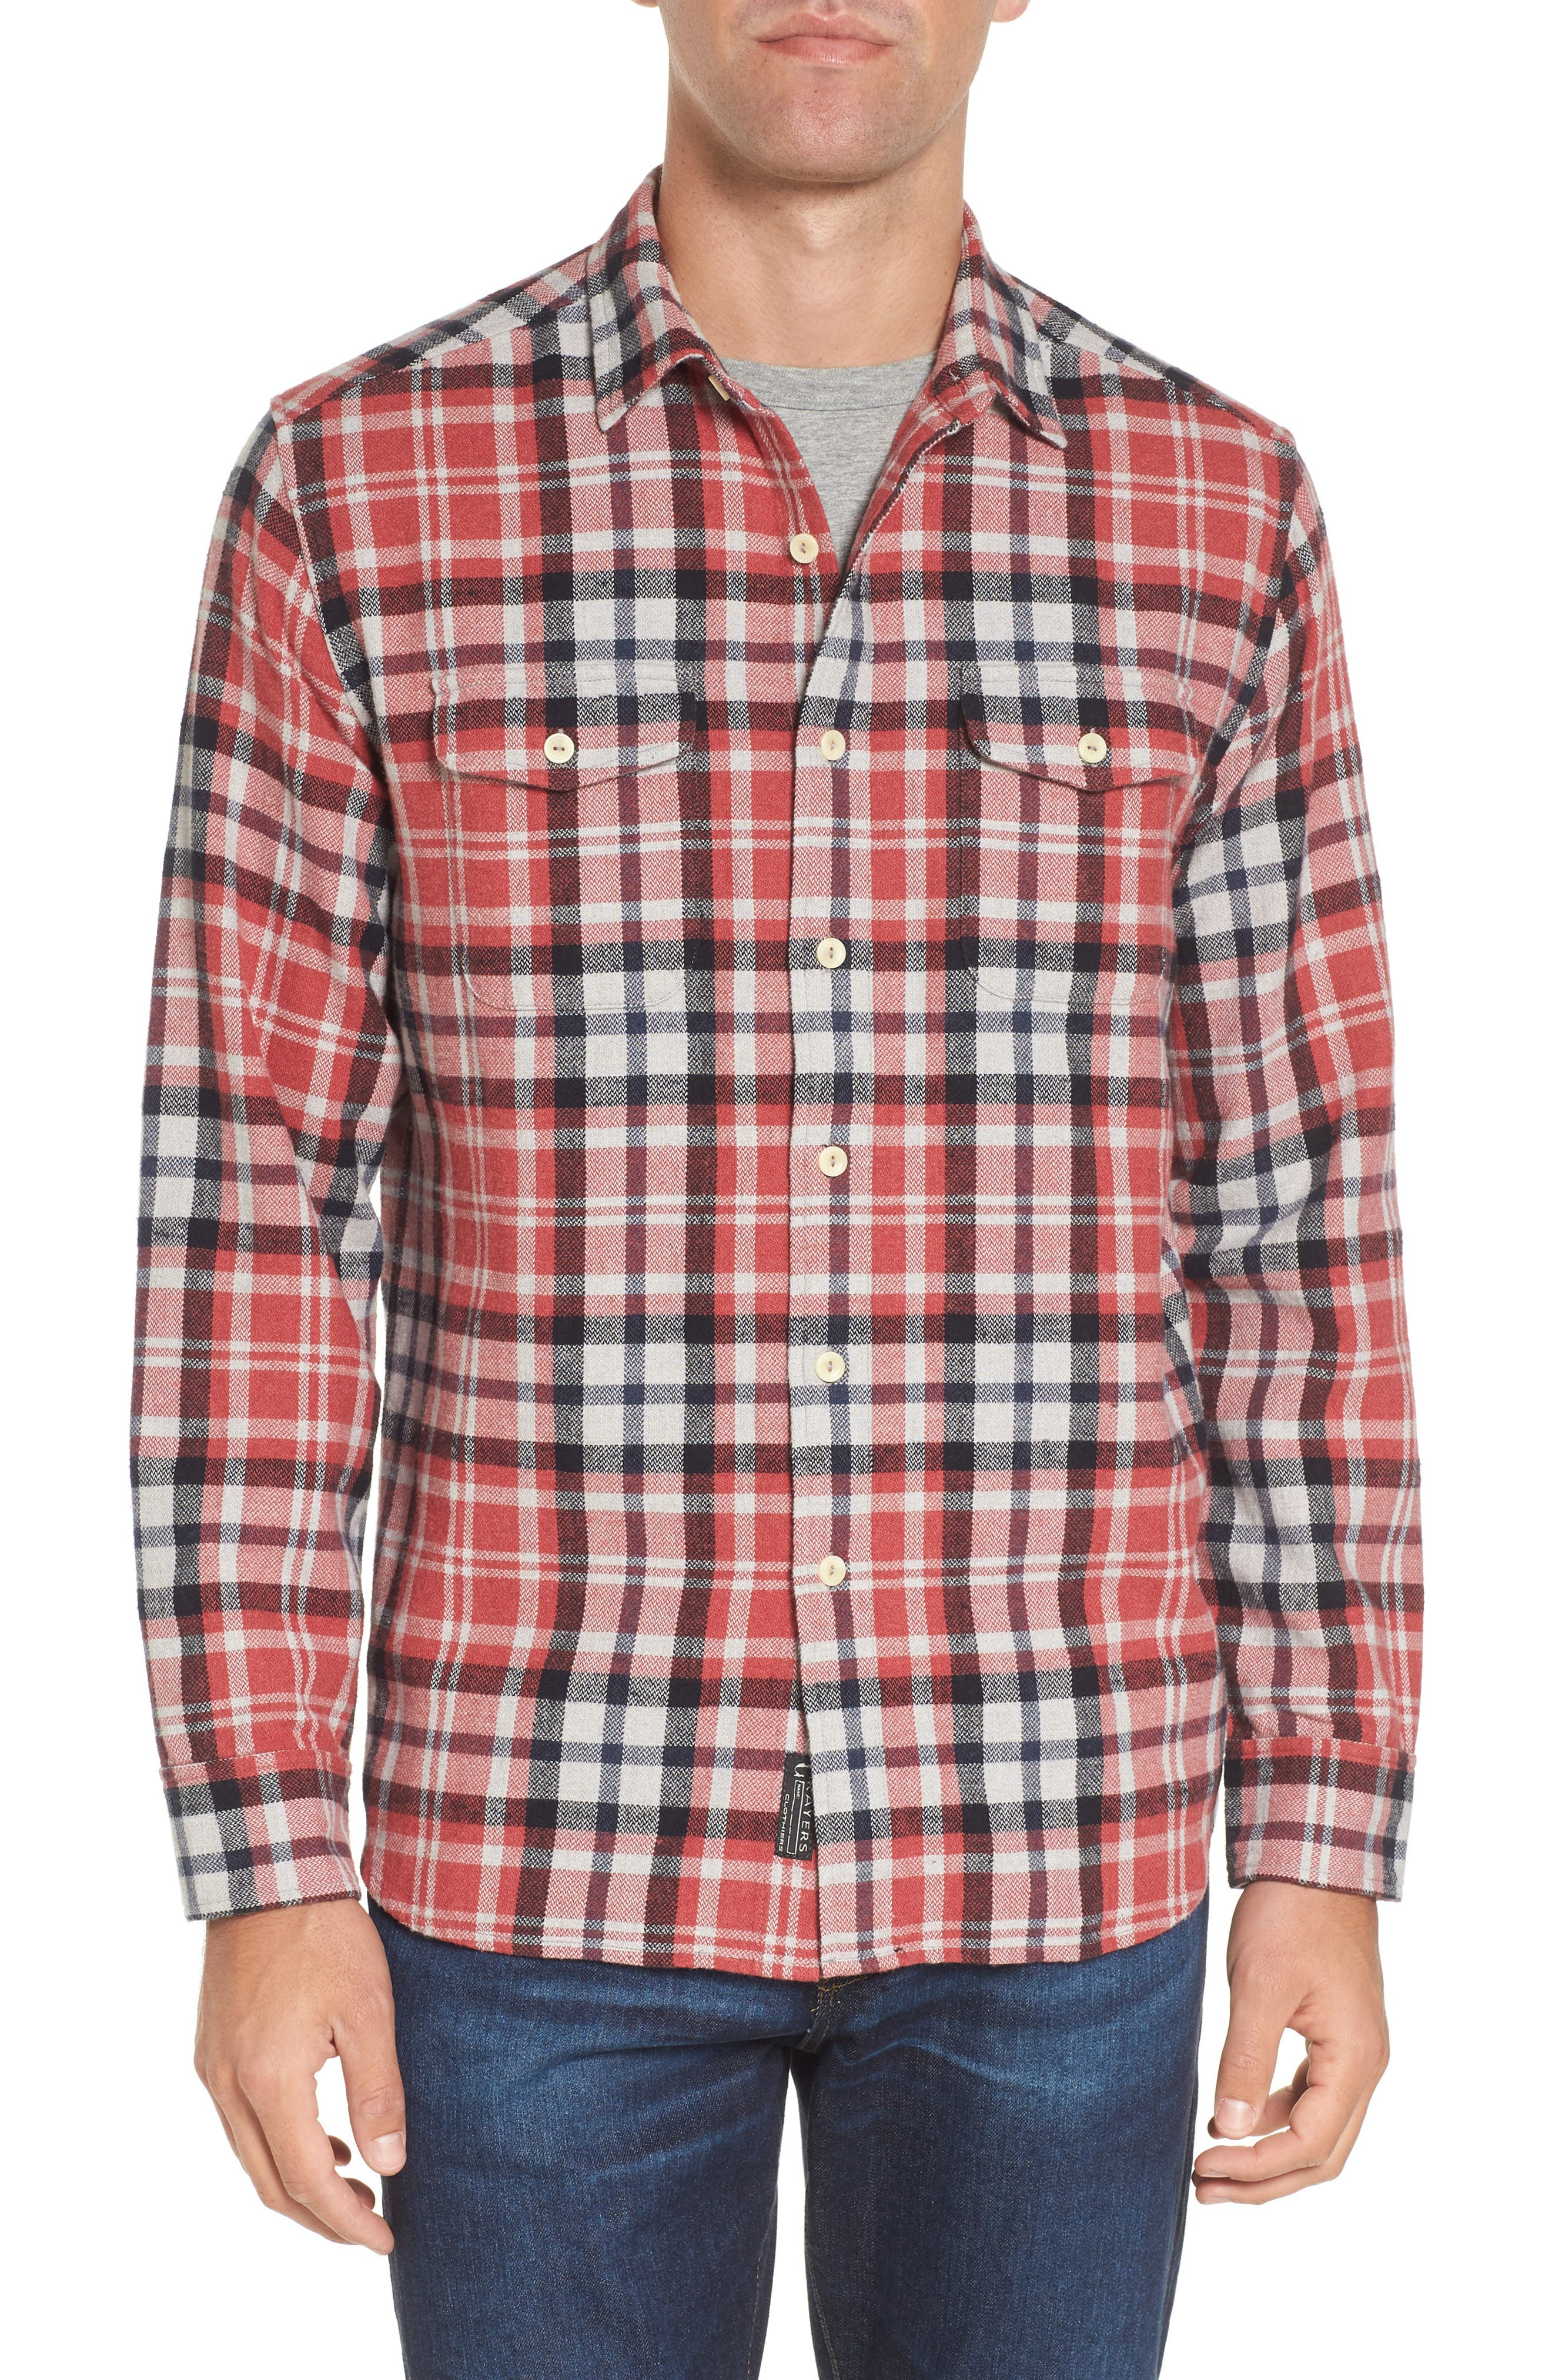 Brampton Textured Plaid Flannel Shirt,                             Main thumbnail 1, color,                             Red Stone Navy